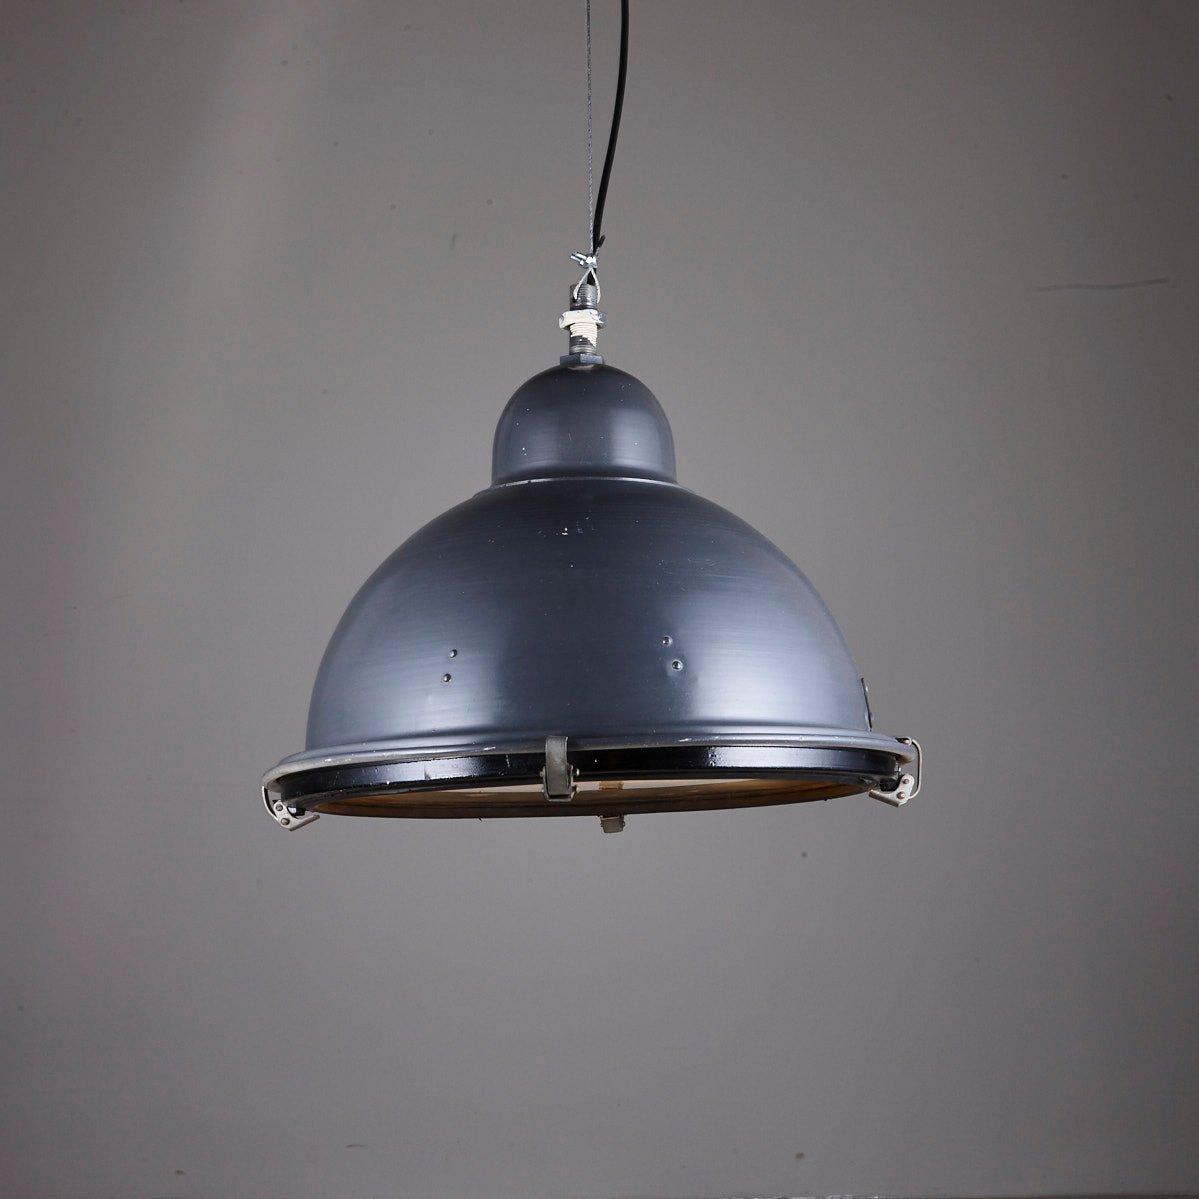 Vintage Semispheric Industrial Pendant For Sale At Pamono